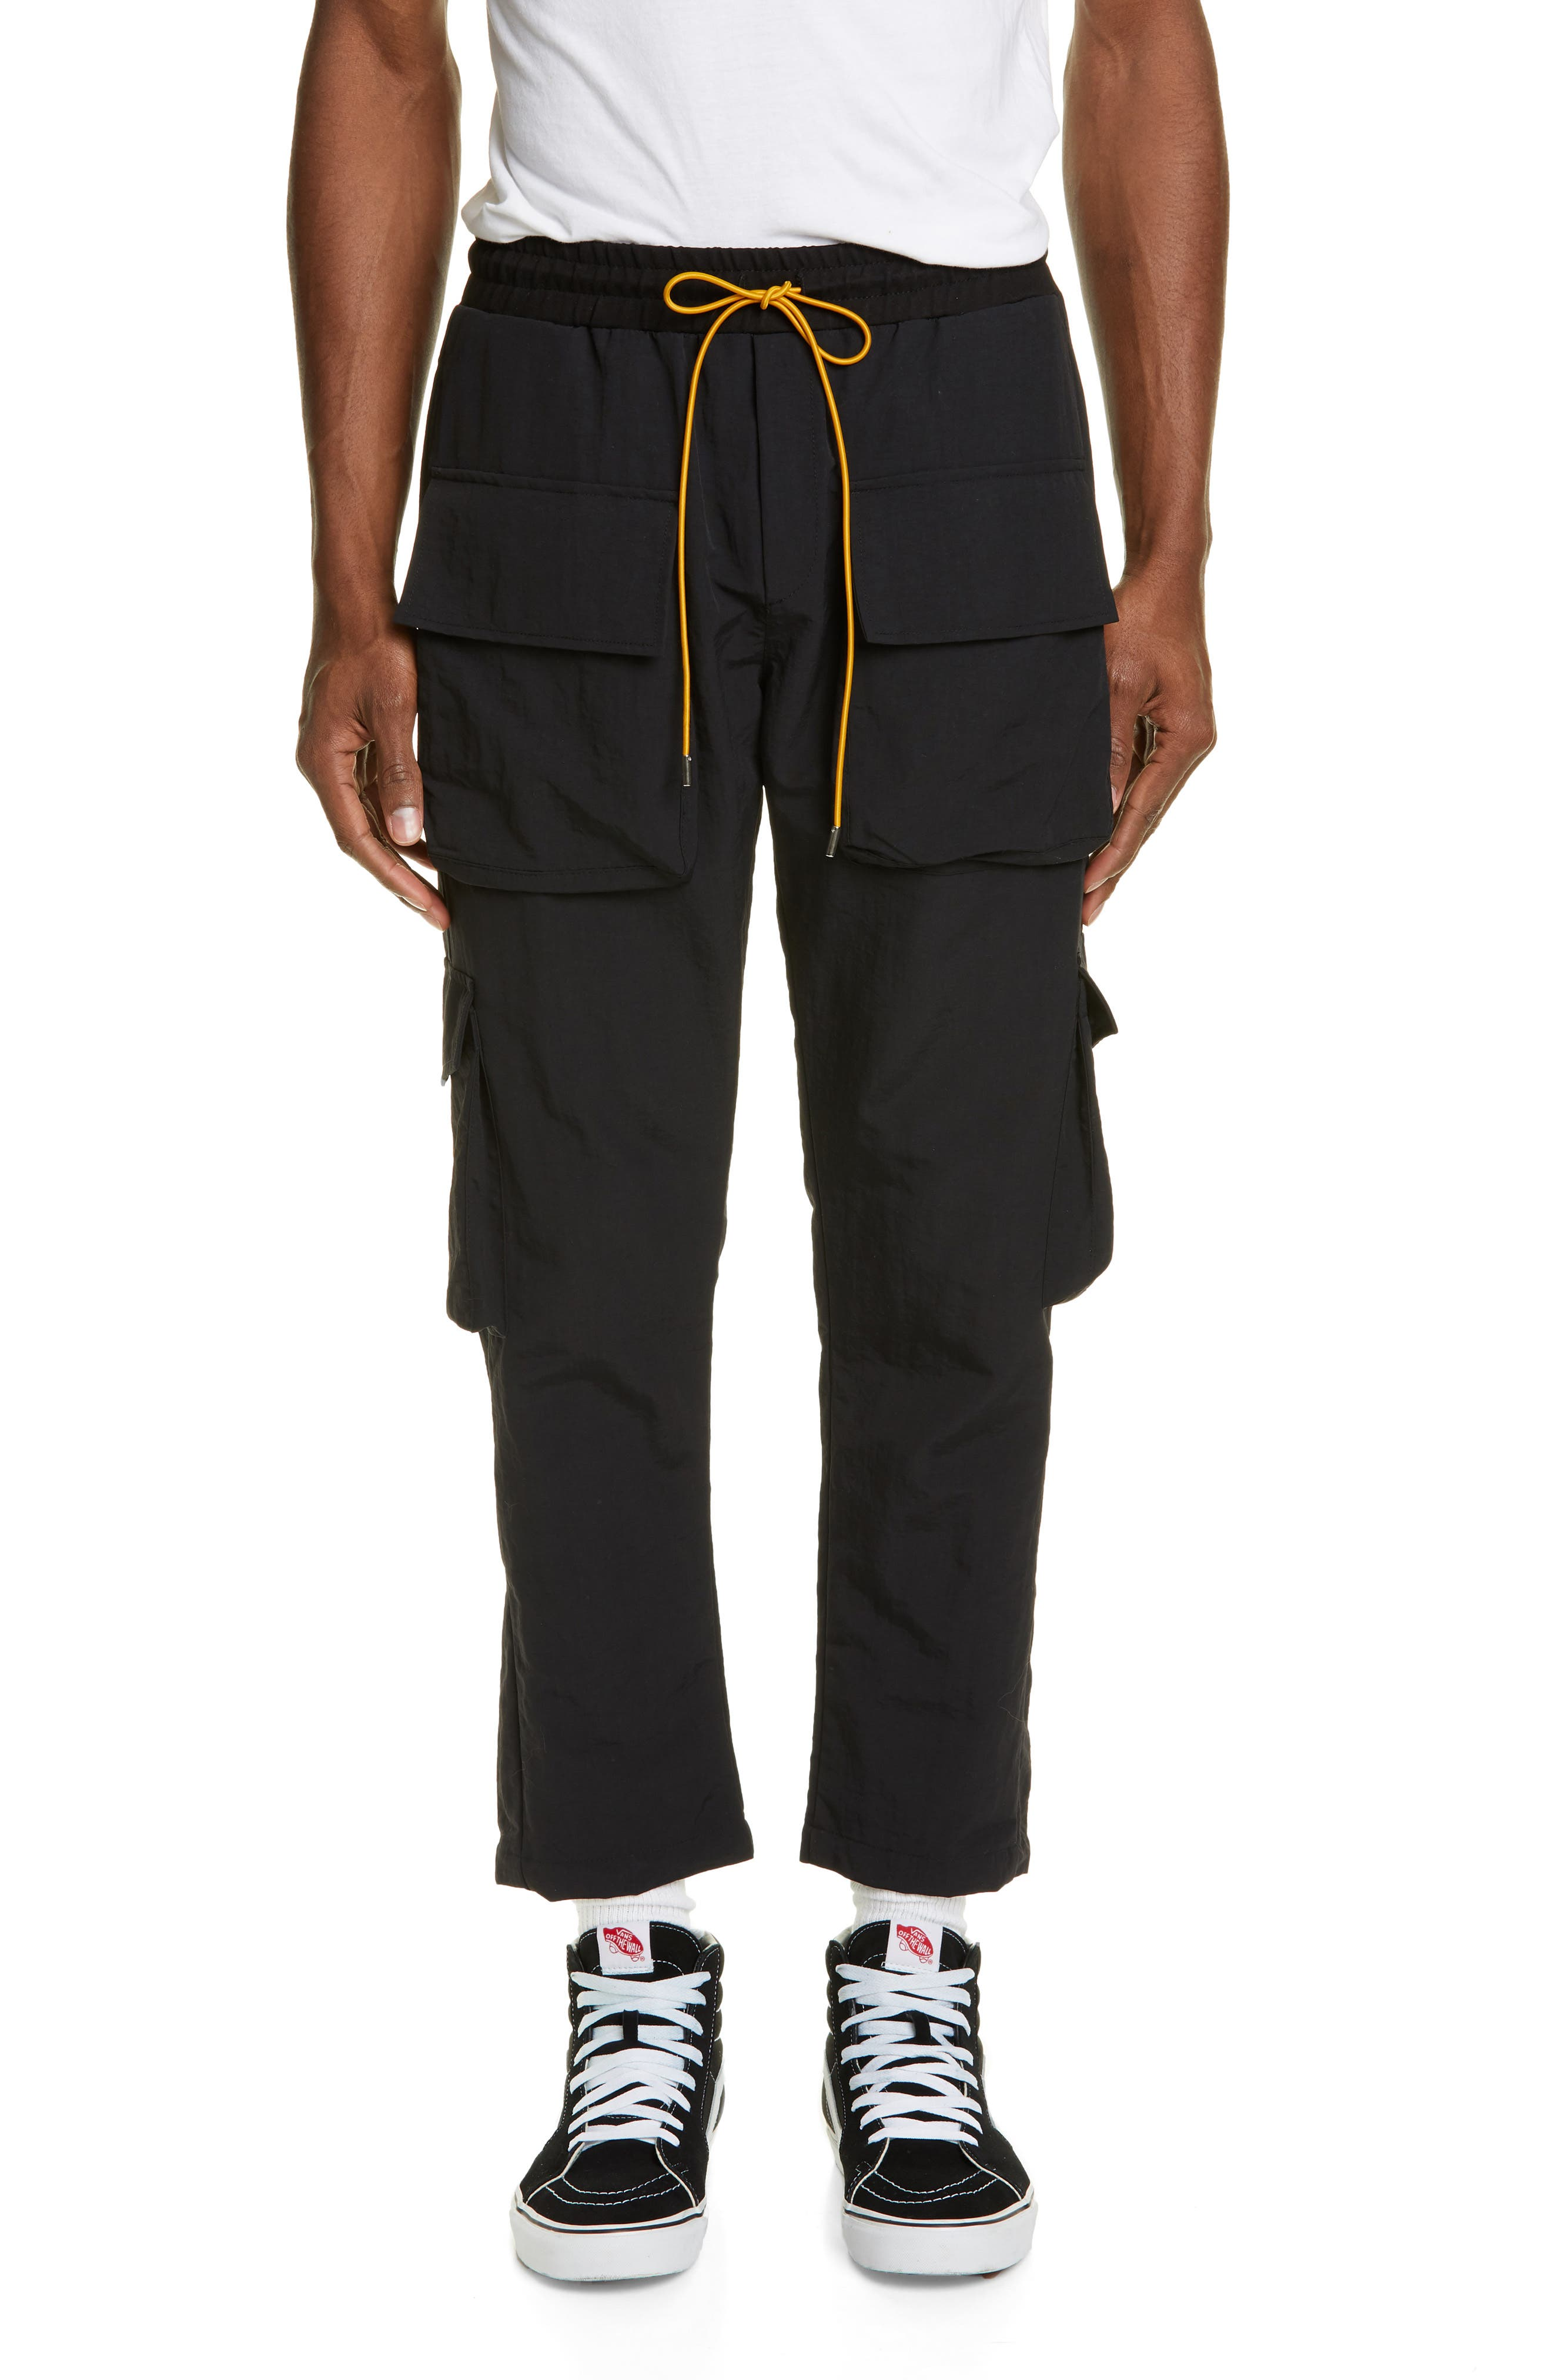 Rhude Rifle Cargo Pants